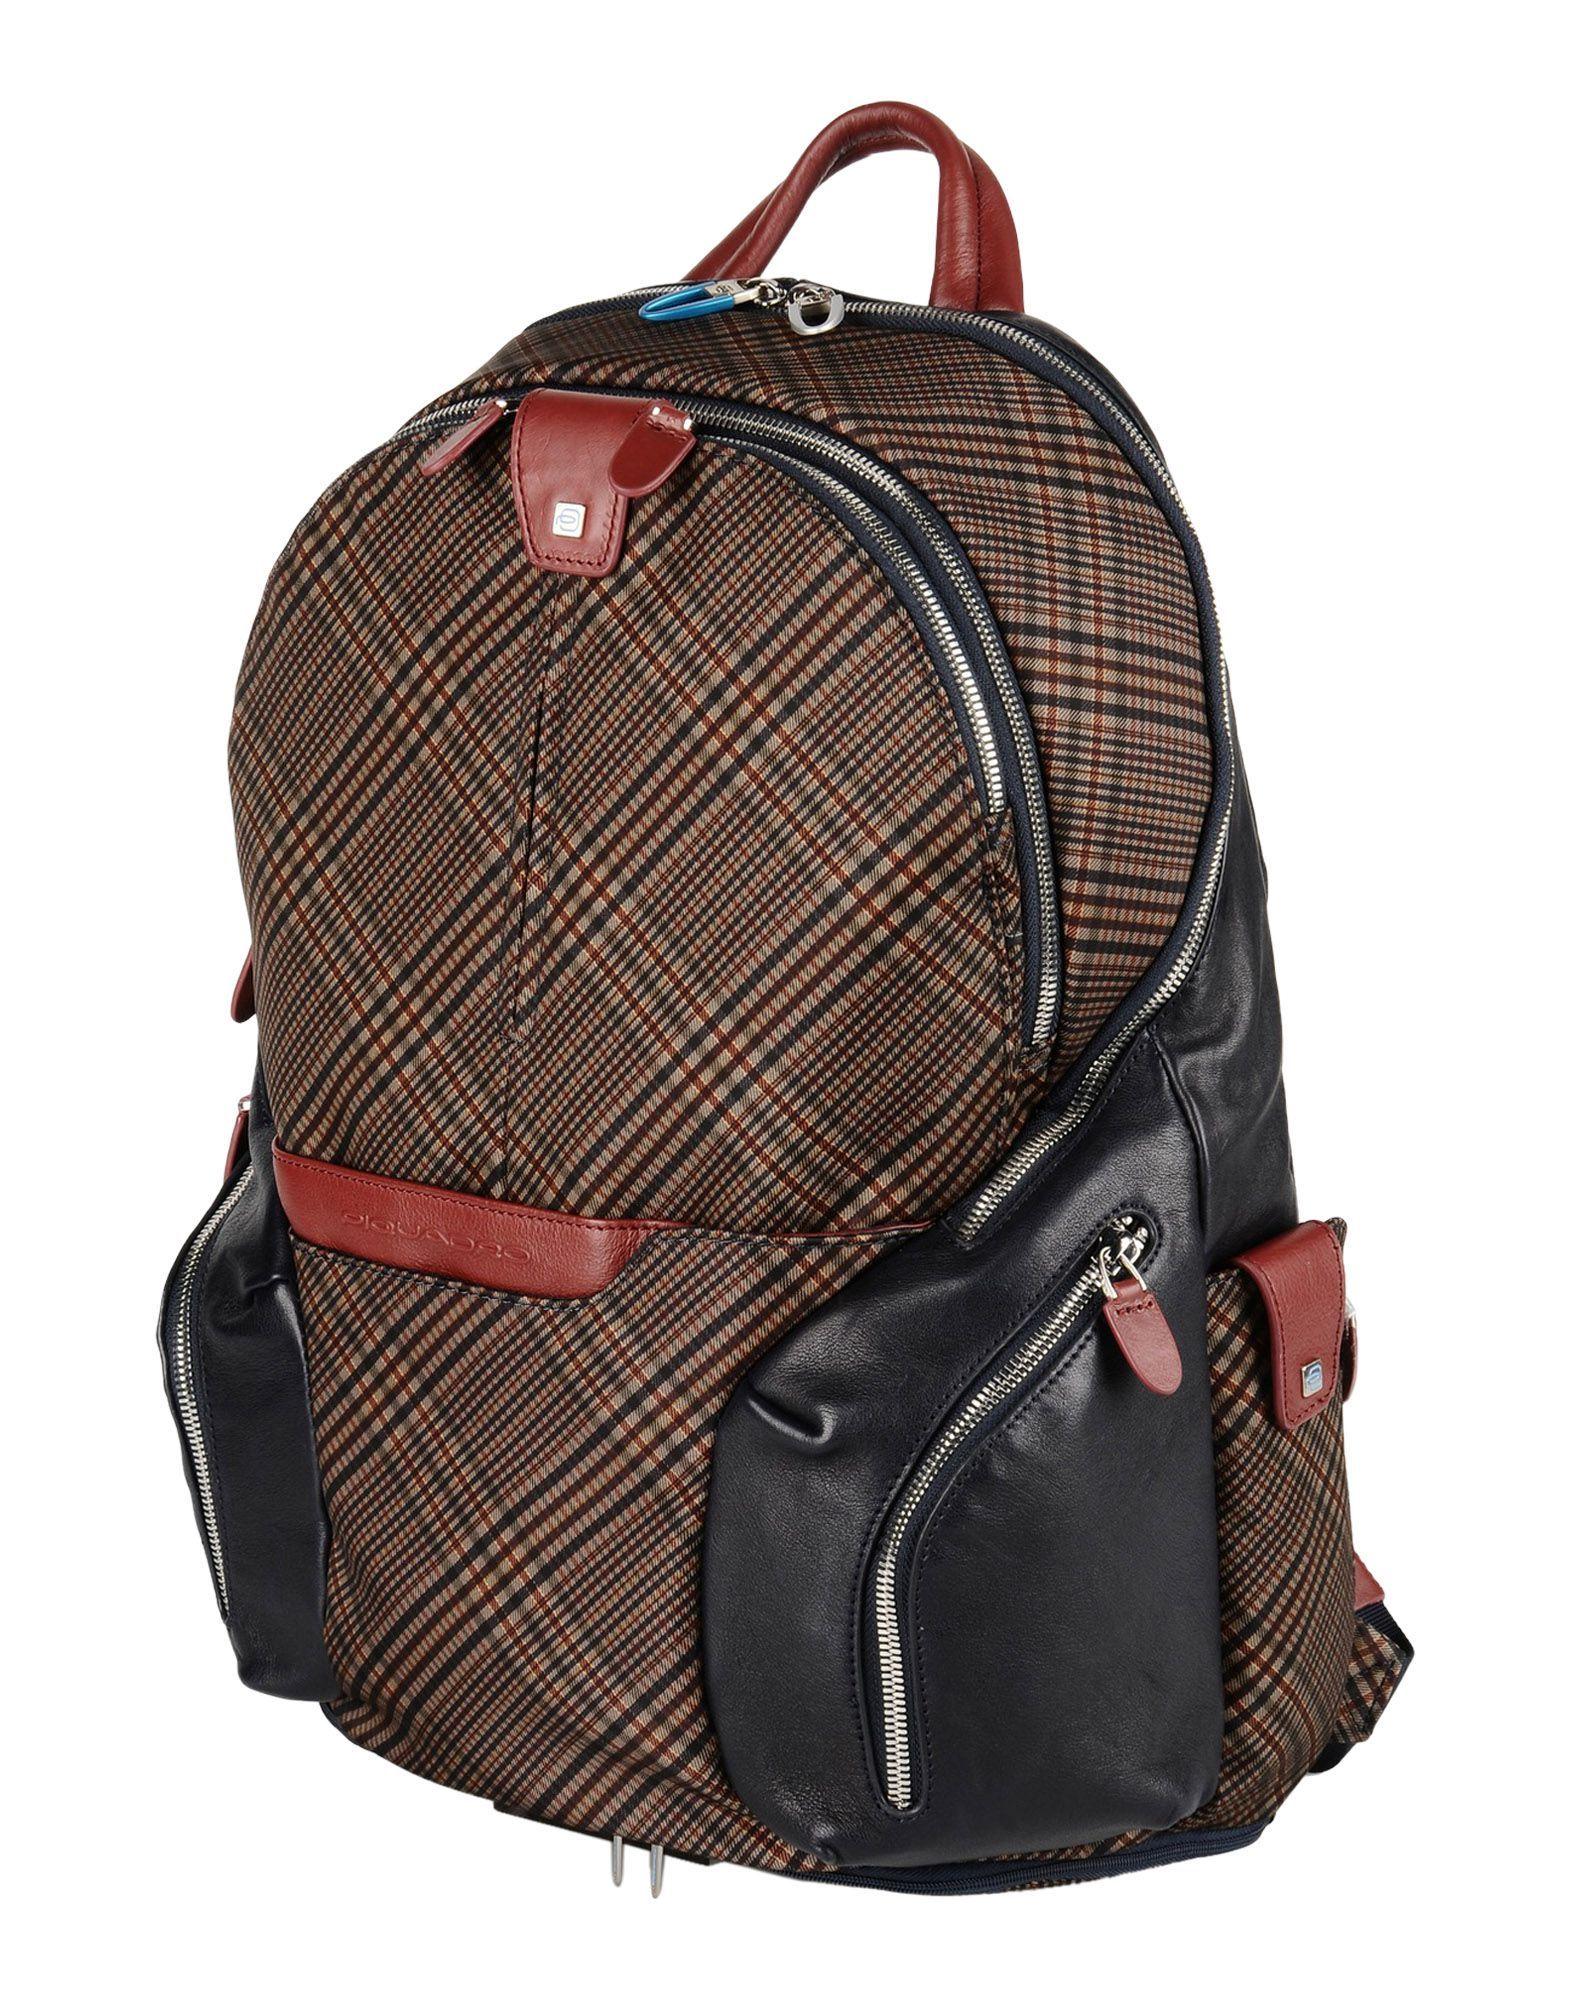 Piquadro Backpack & Fanny Pack - Men Piquadro Backpacks & Fanny Packs online on YOOX United States - 45312260